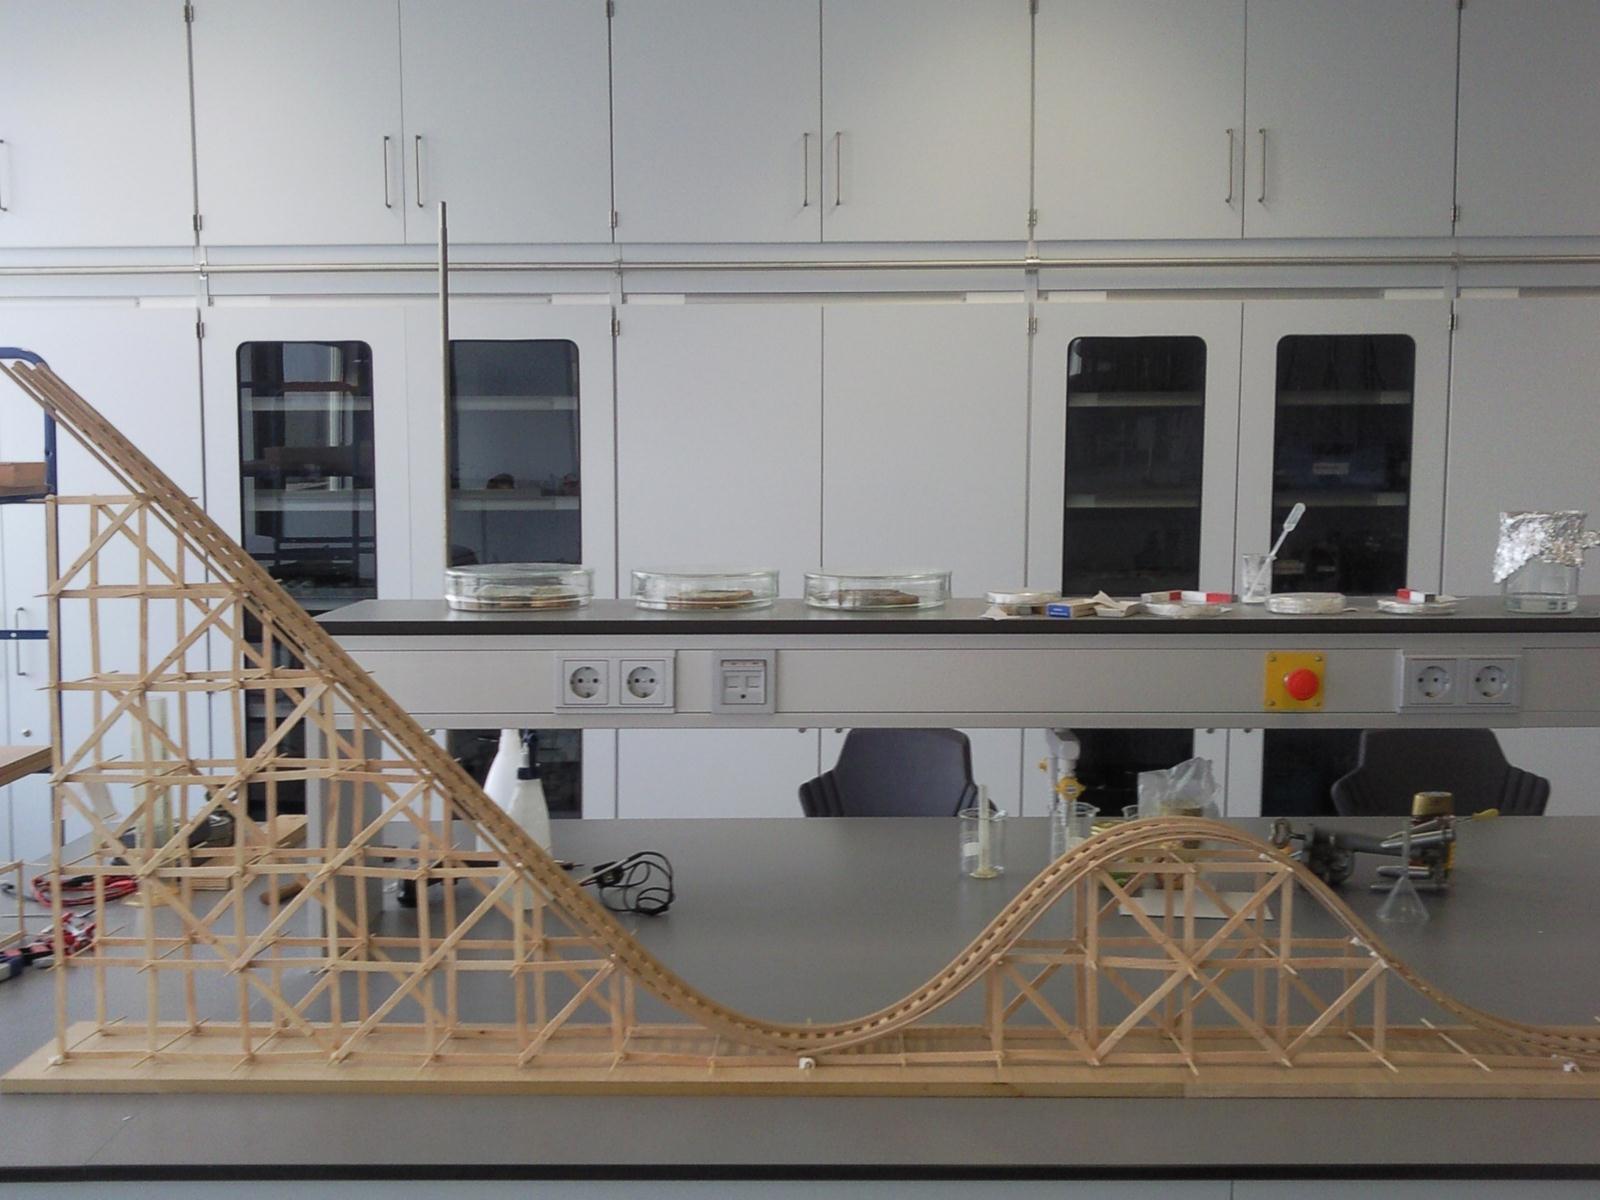 Wooden Roller coaster model (Engels/English)